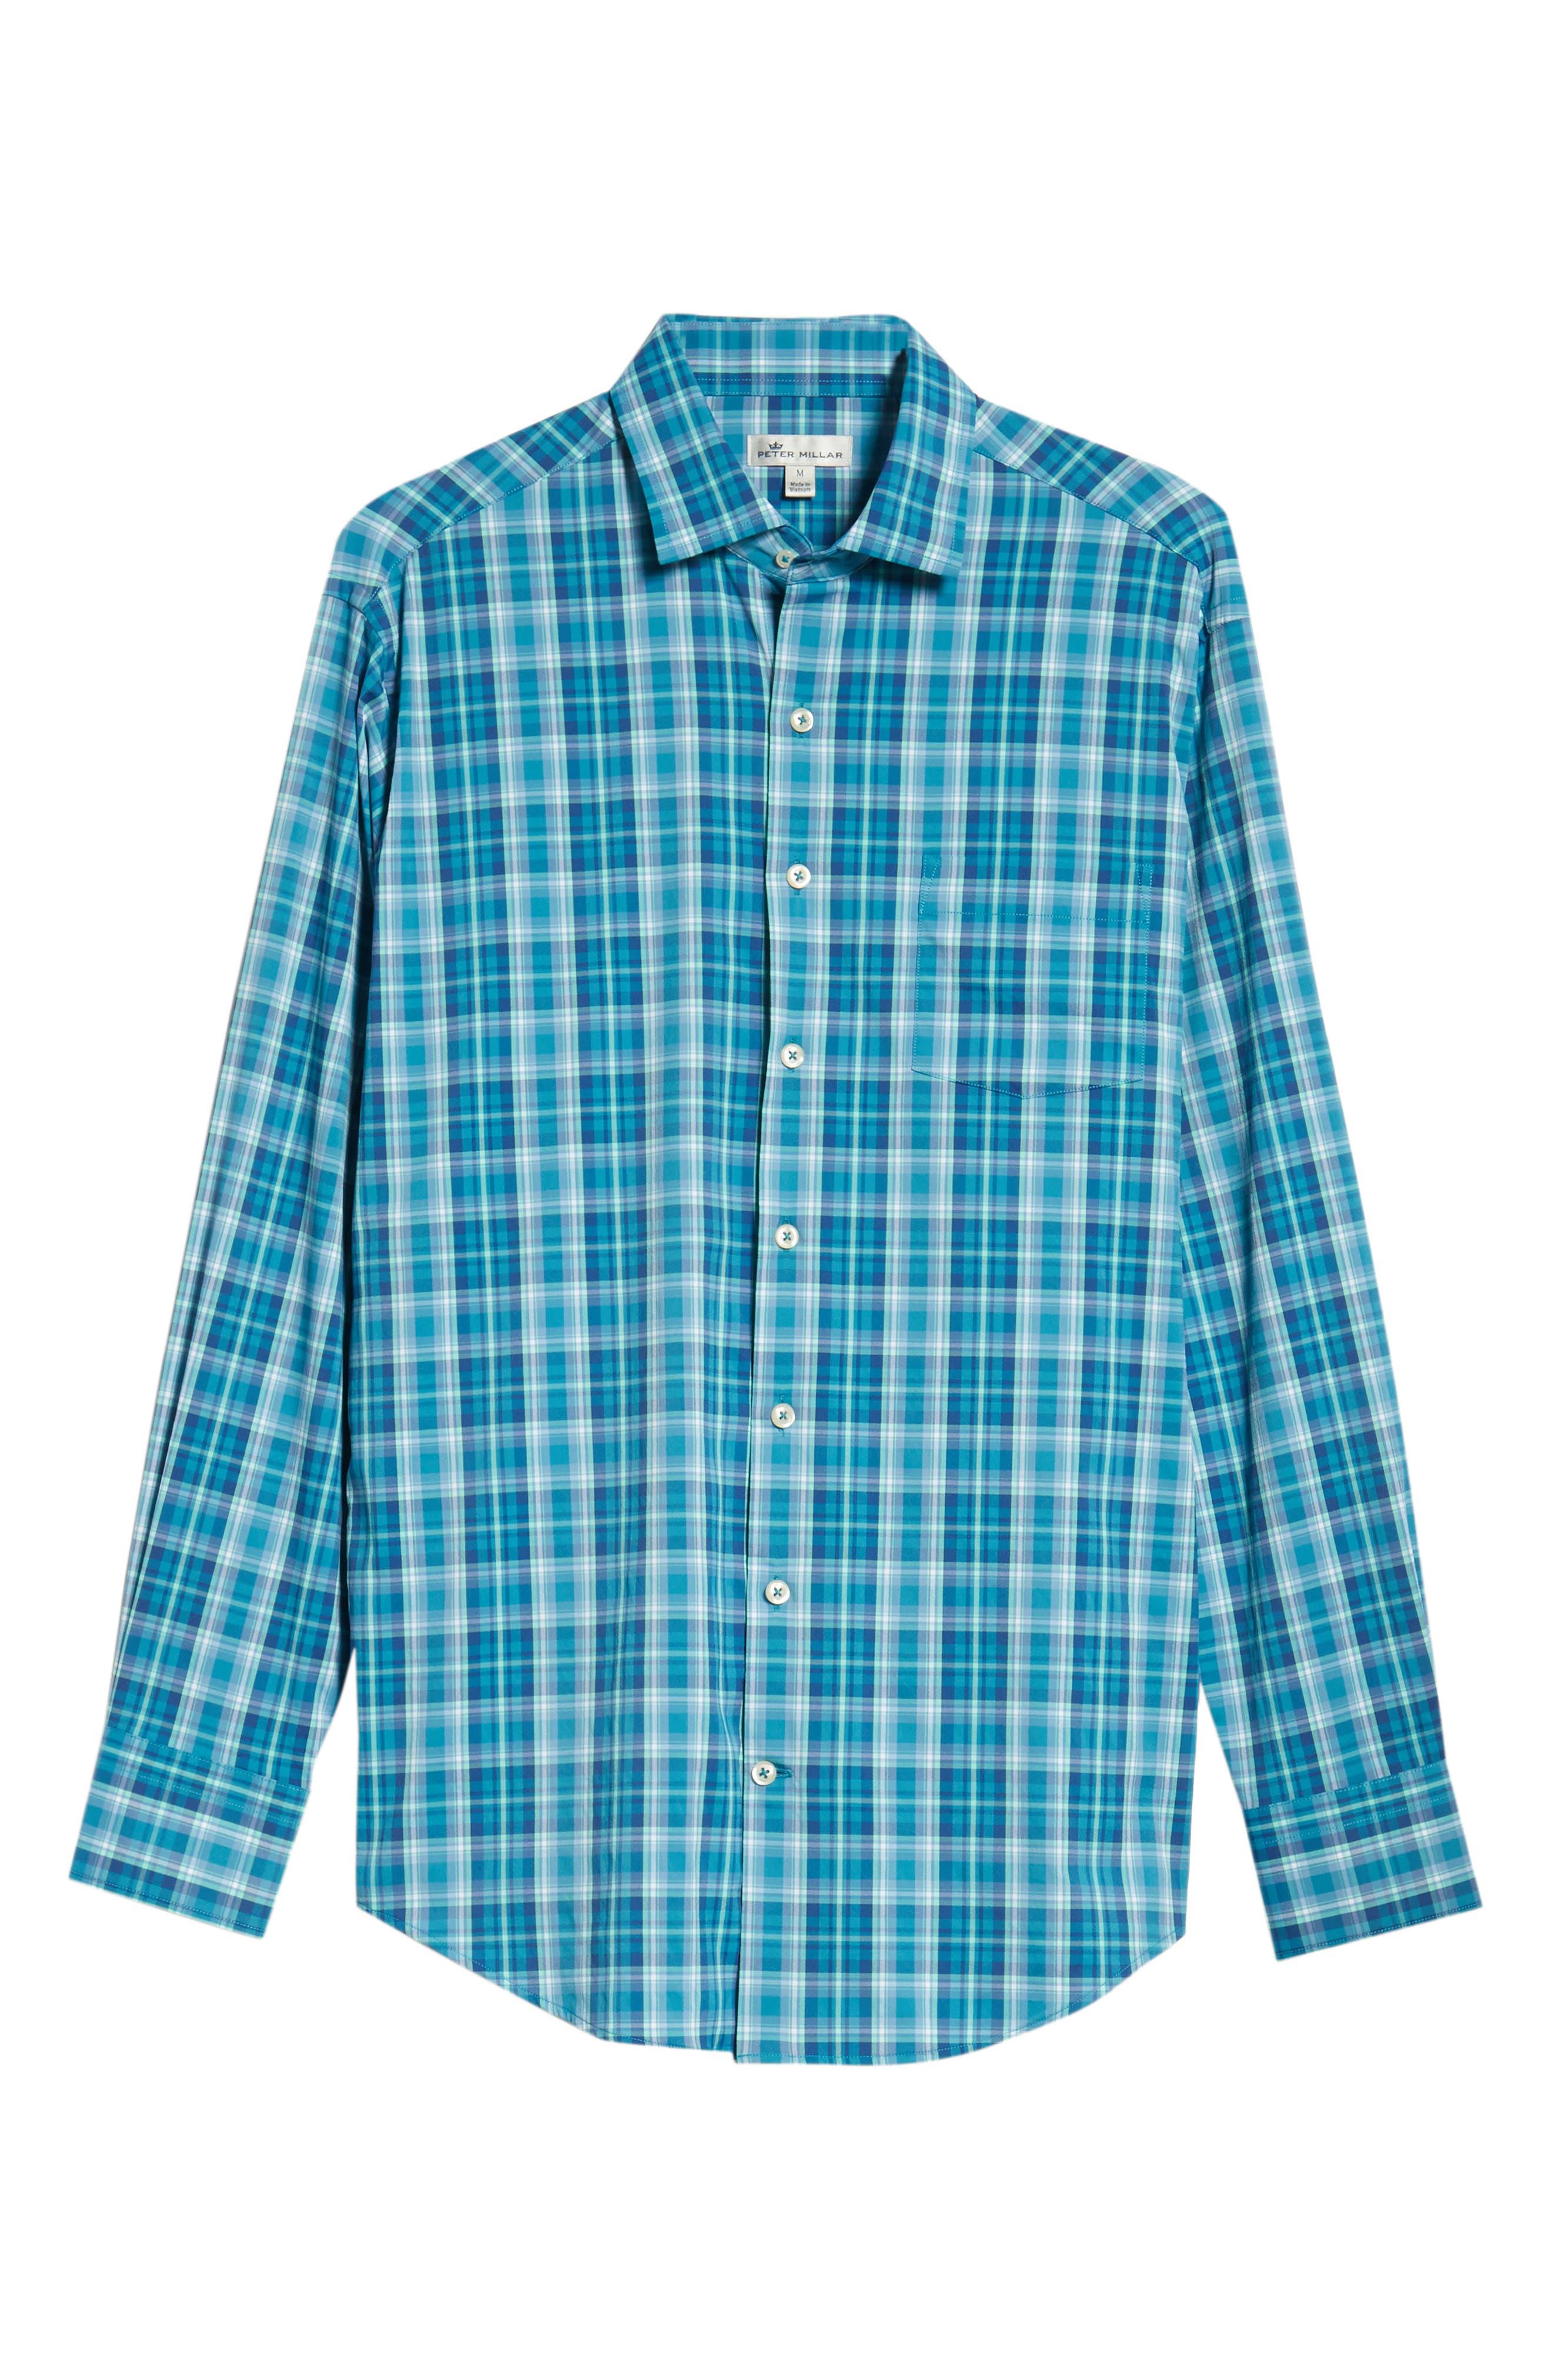 Van Regular Fit Check Performance Sport Shirt,                             Alternate thumbnail 5, color,                             BLUE